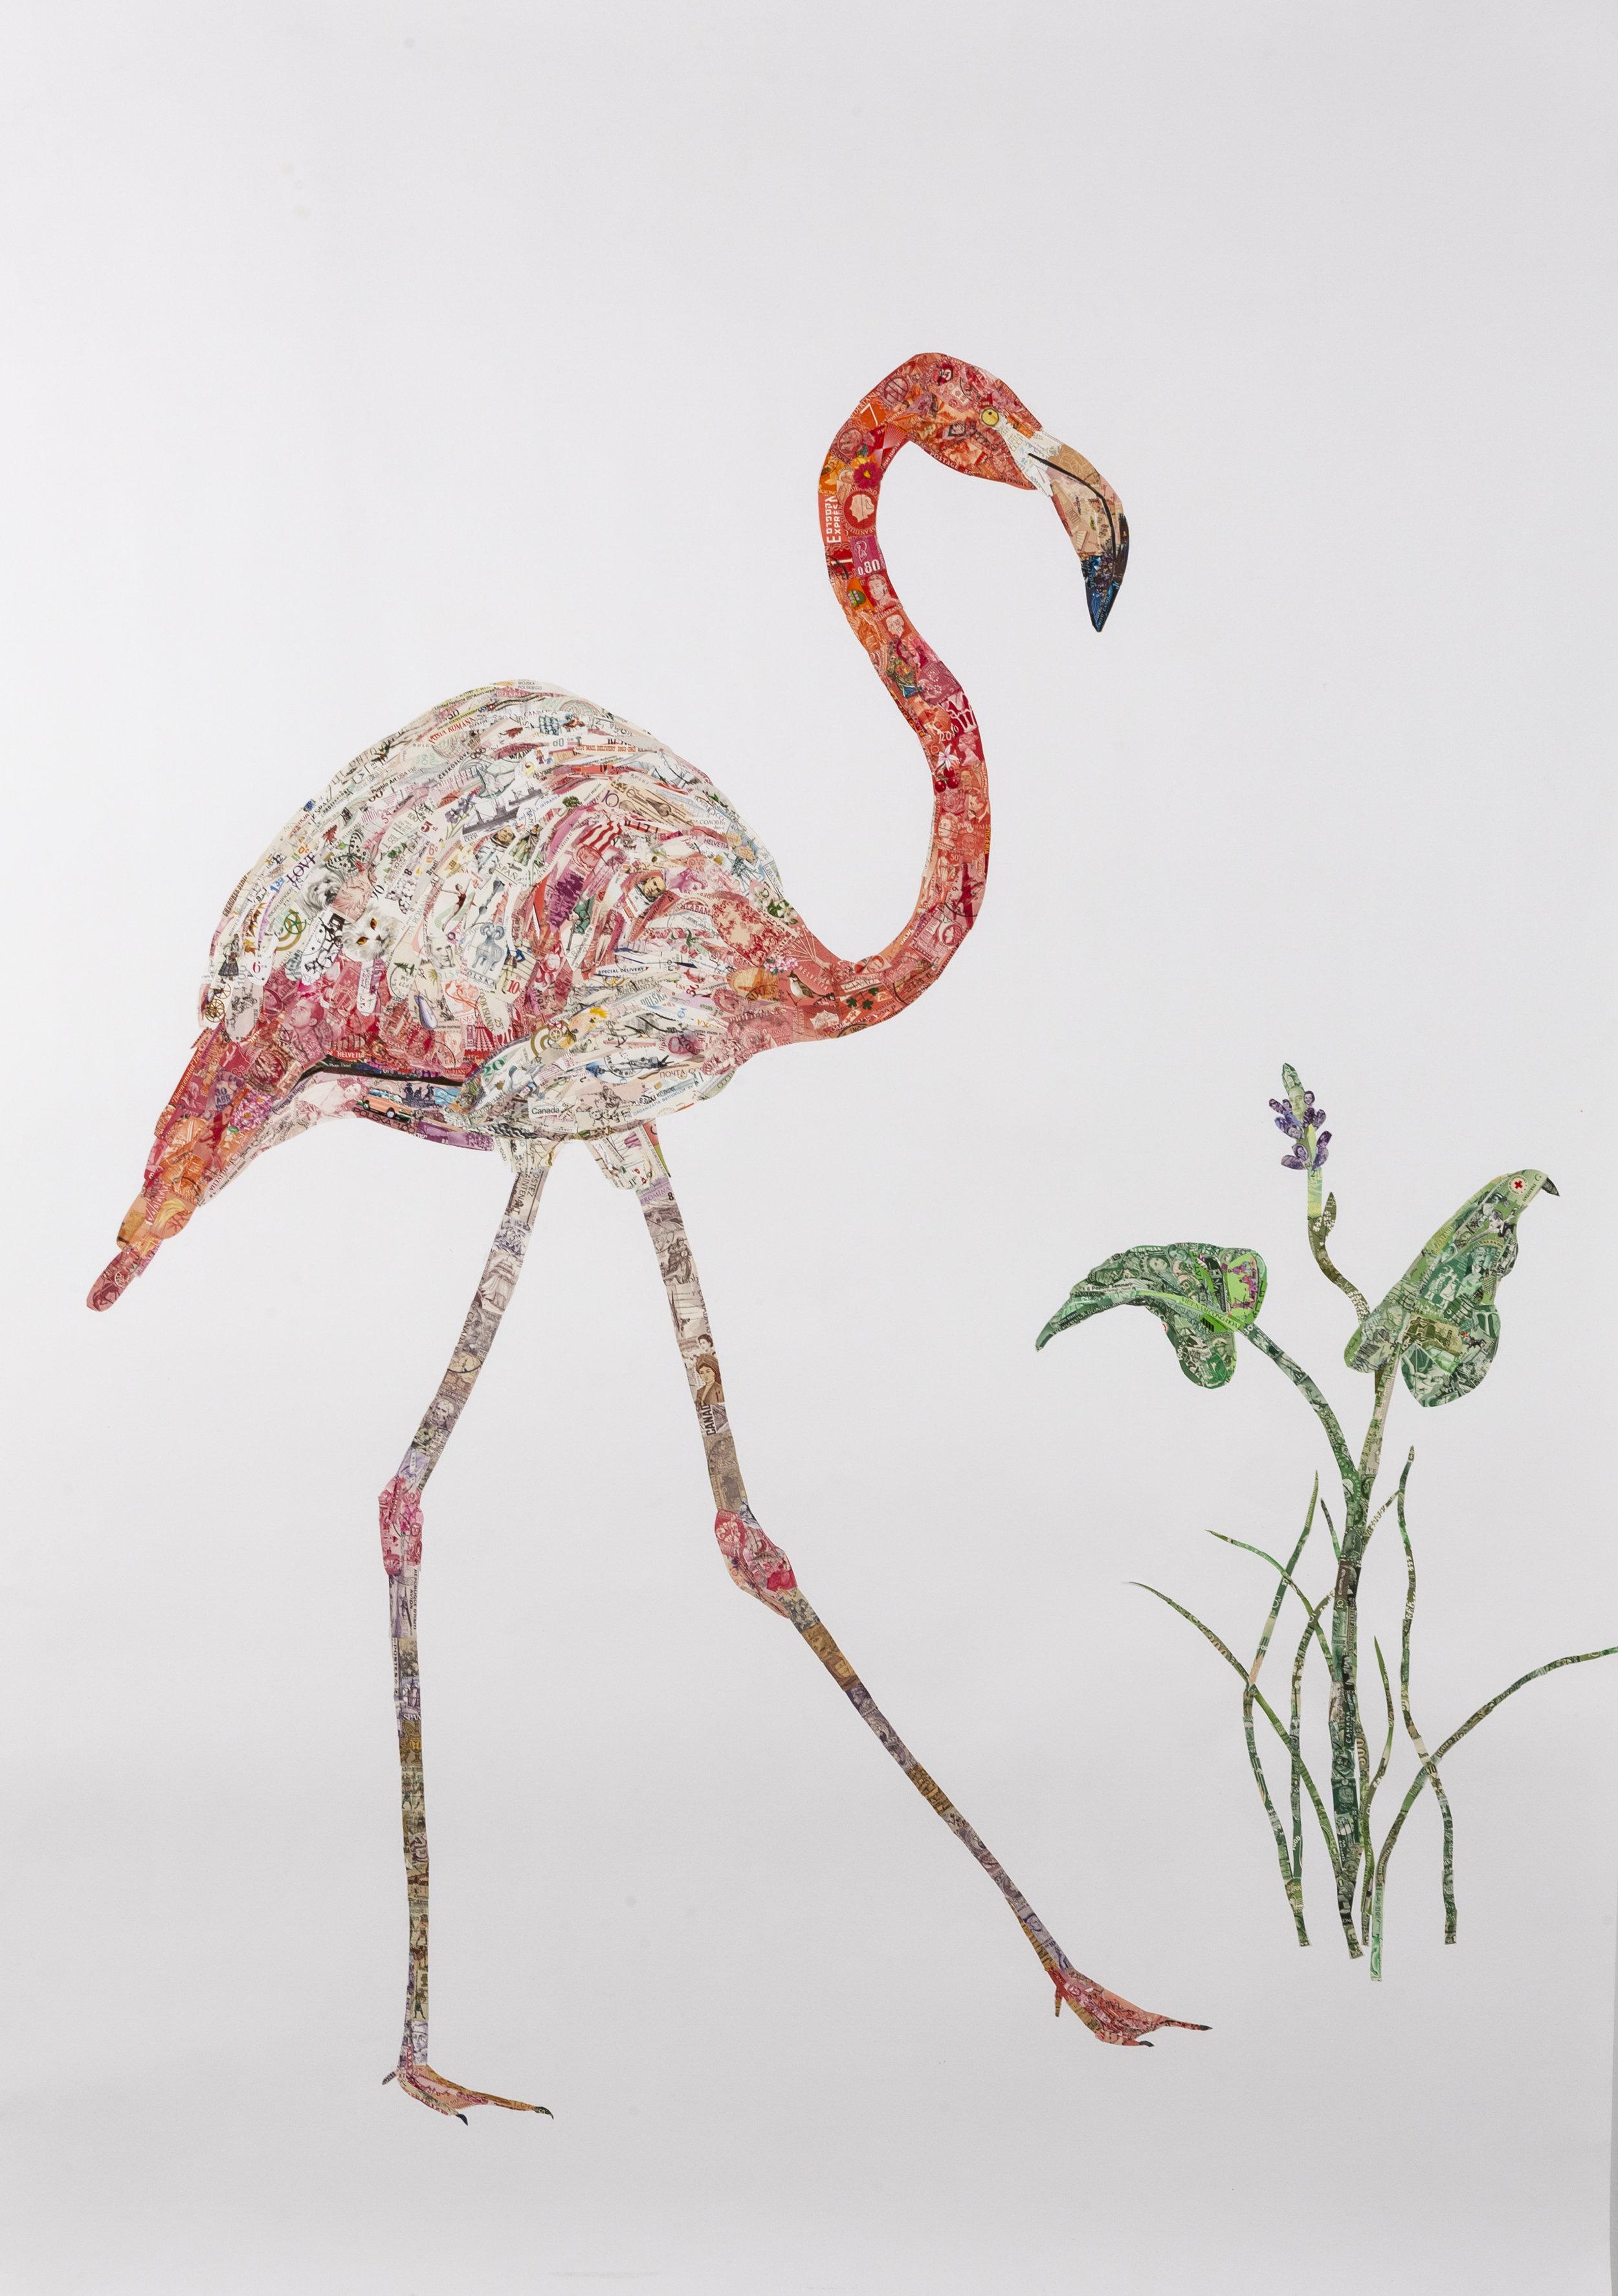 American Flamingo, 2018